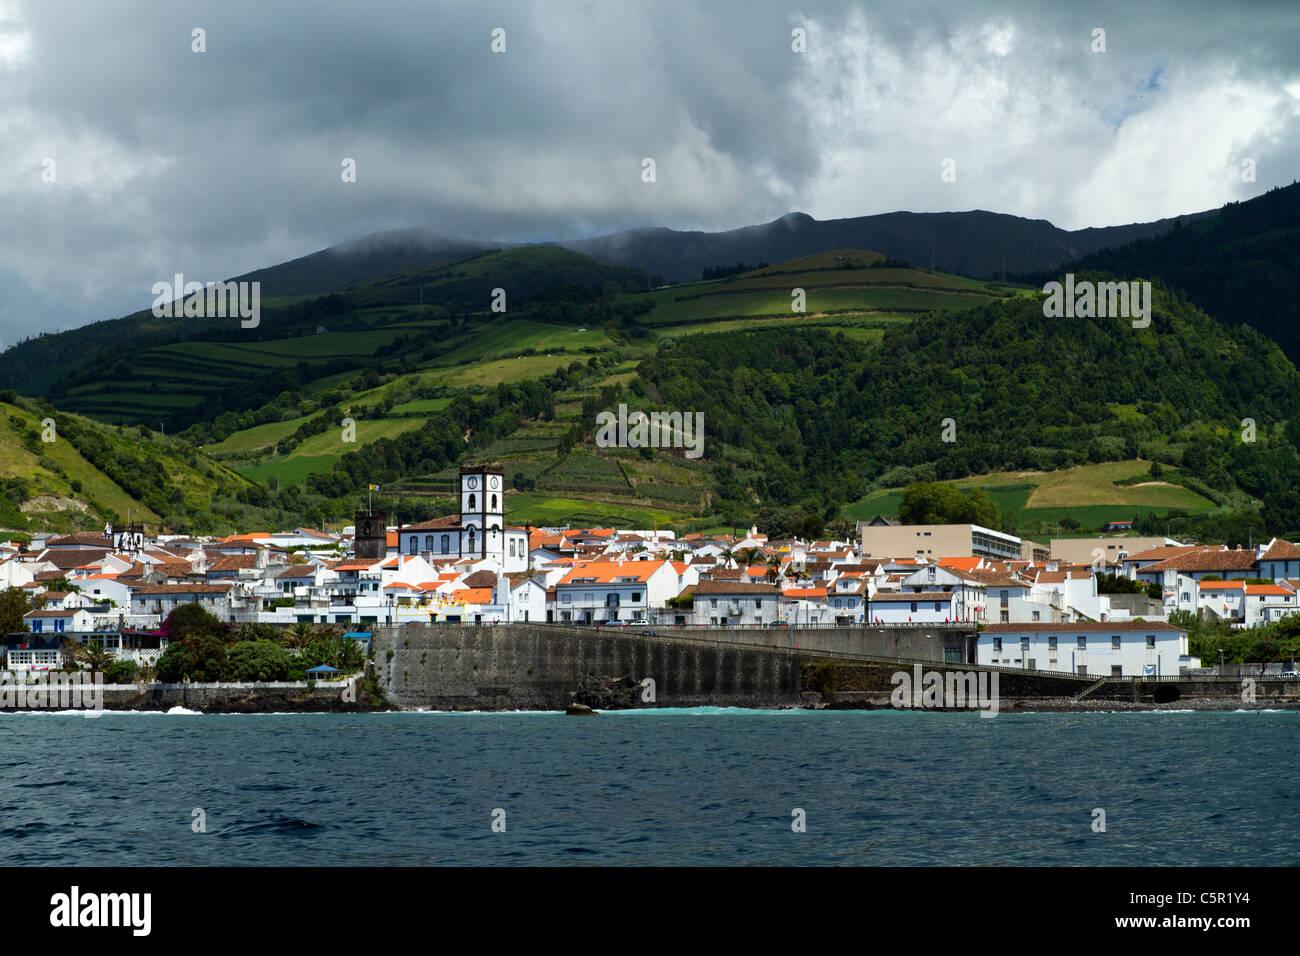 Vila Franca do Campo, seen from the sea, São Miguel island, Azores. - Stock Image